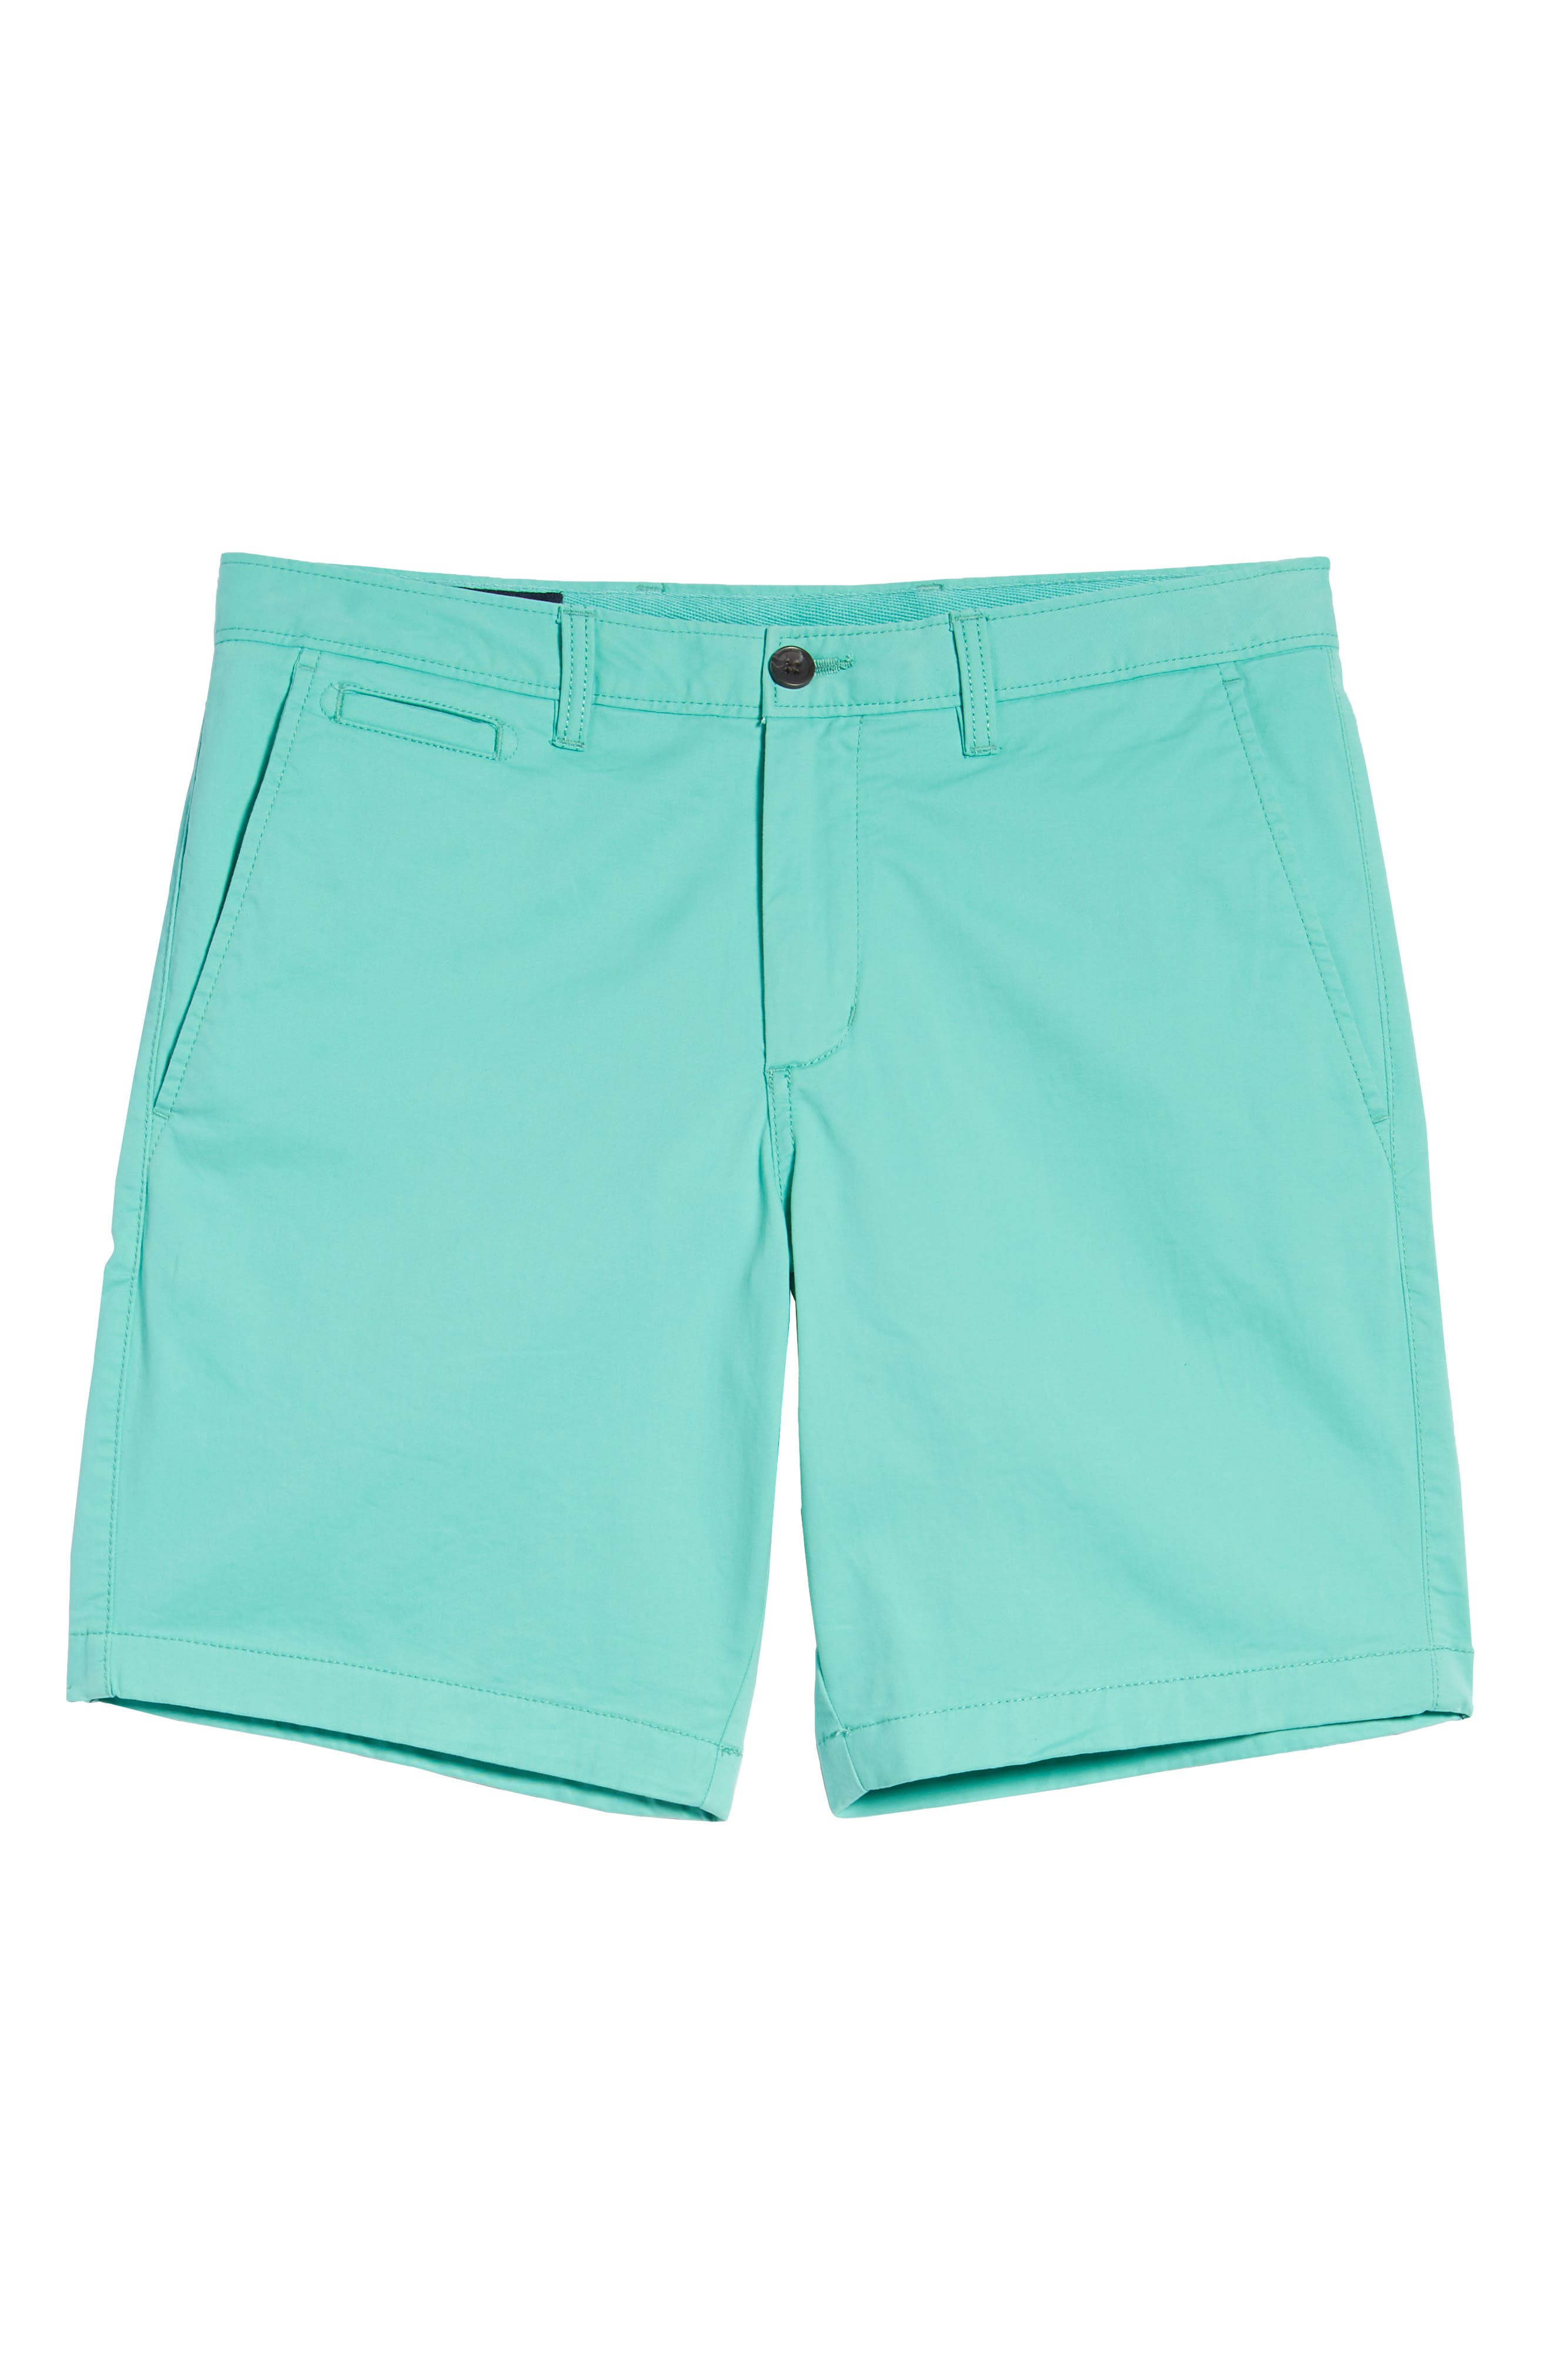 Ballard Slim Fit Stretch Chino 9-Inch Shorts,                             Alternate thumbnail 66, color,